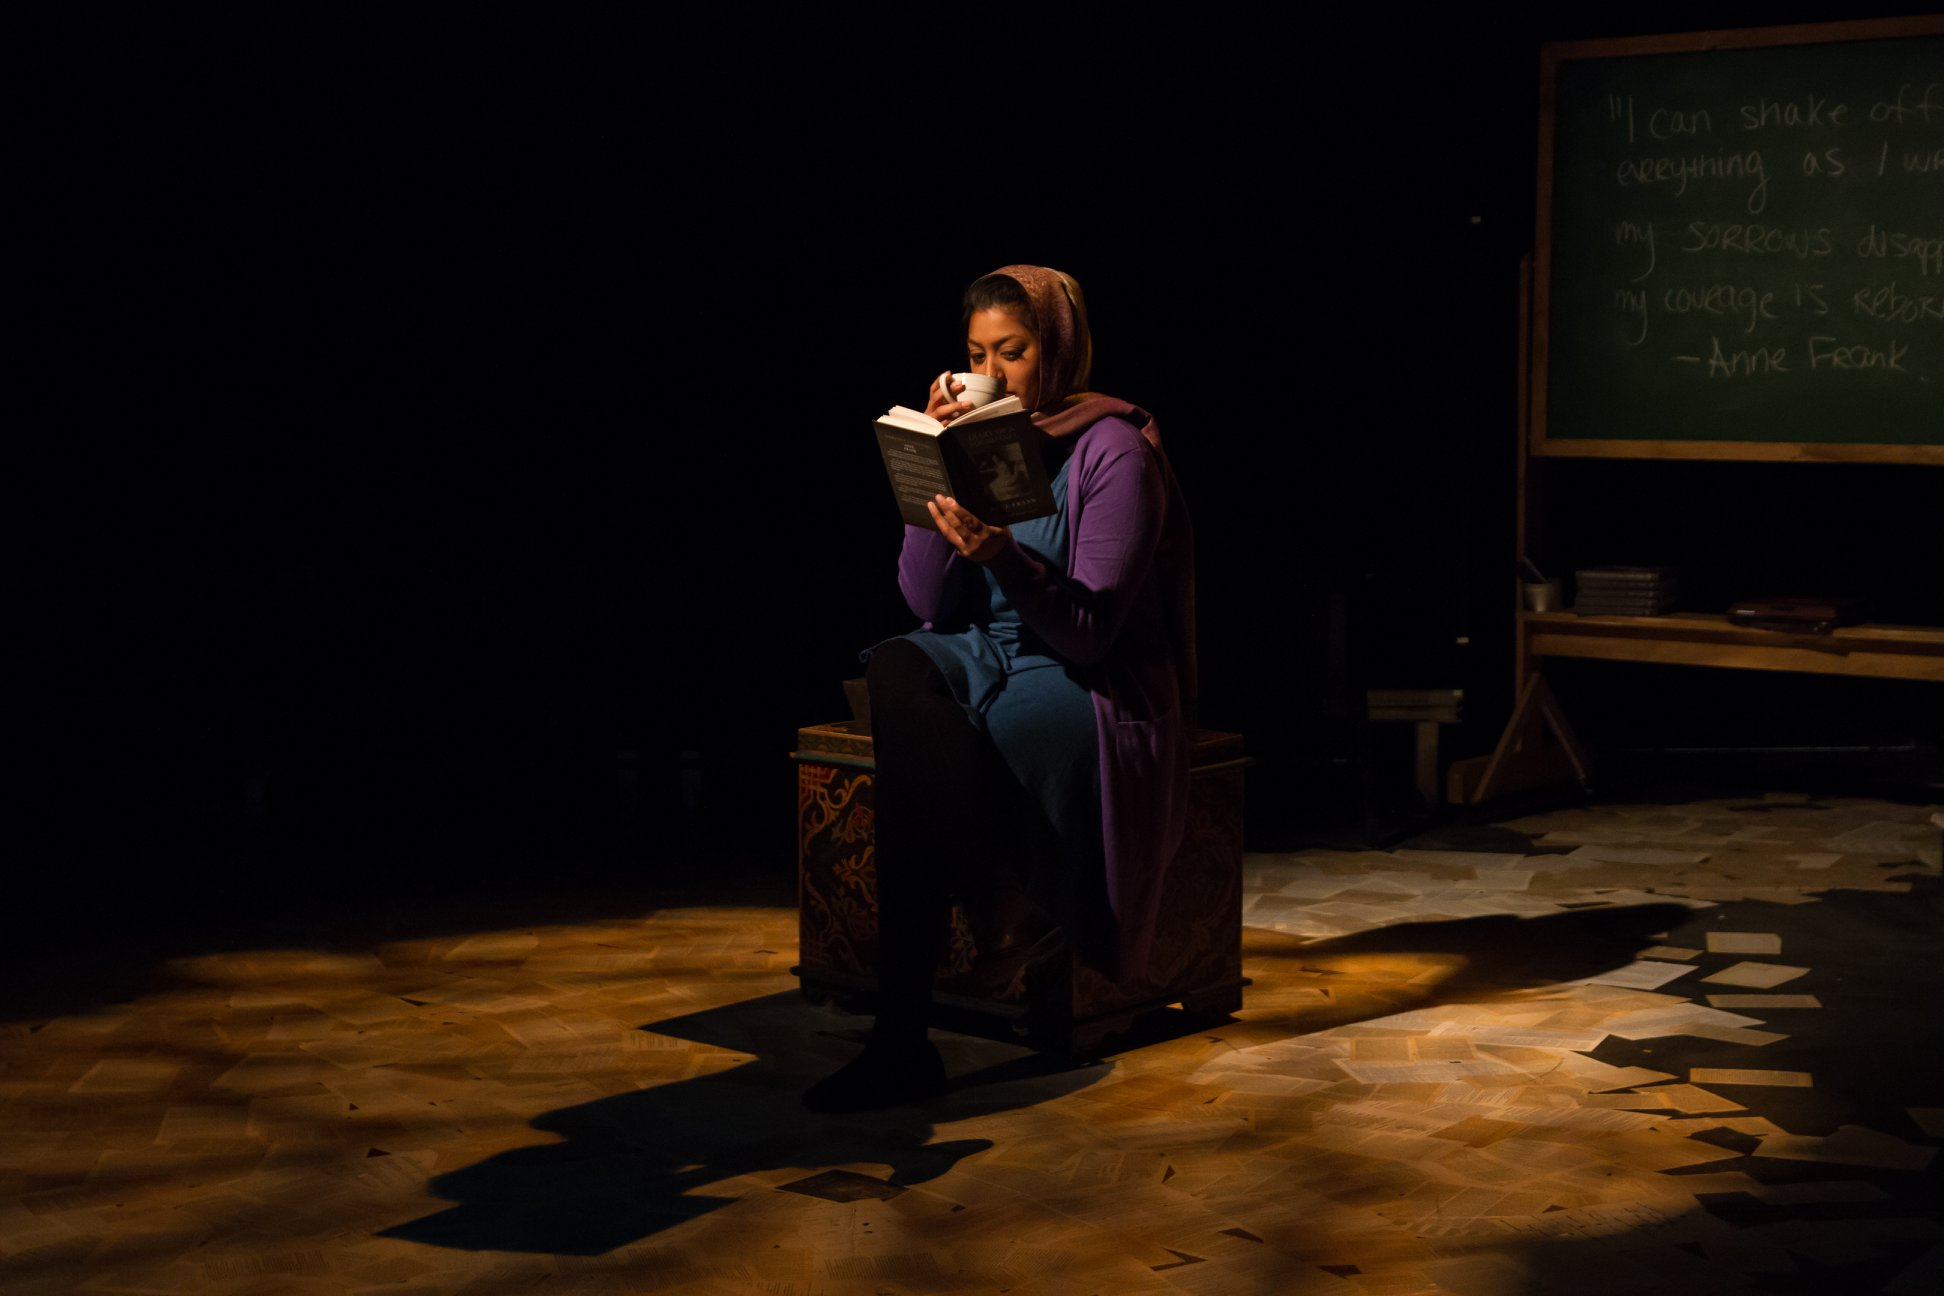 Geetee reads Anne Frank